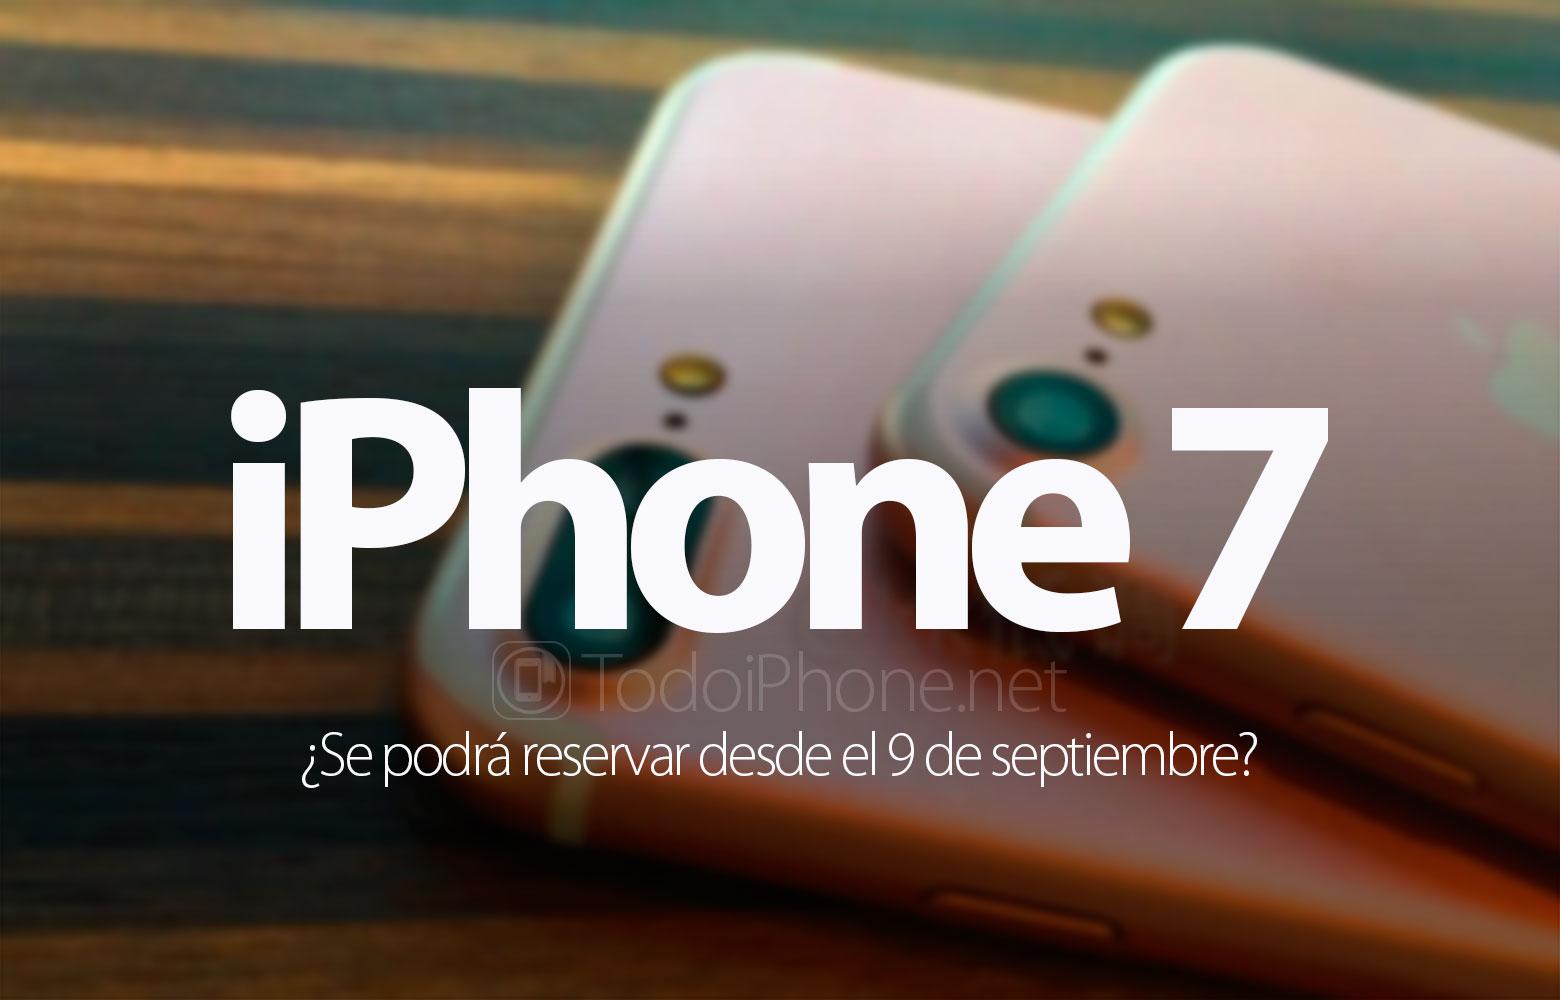 iphone-7-podra-reservar-9-septiembre